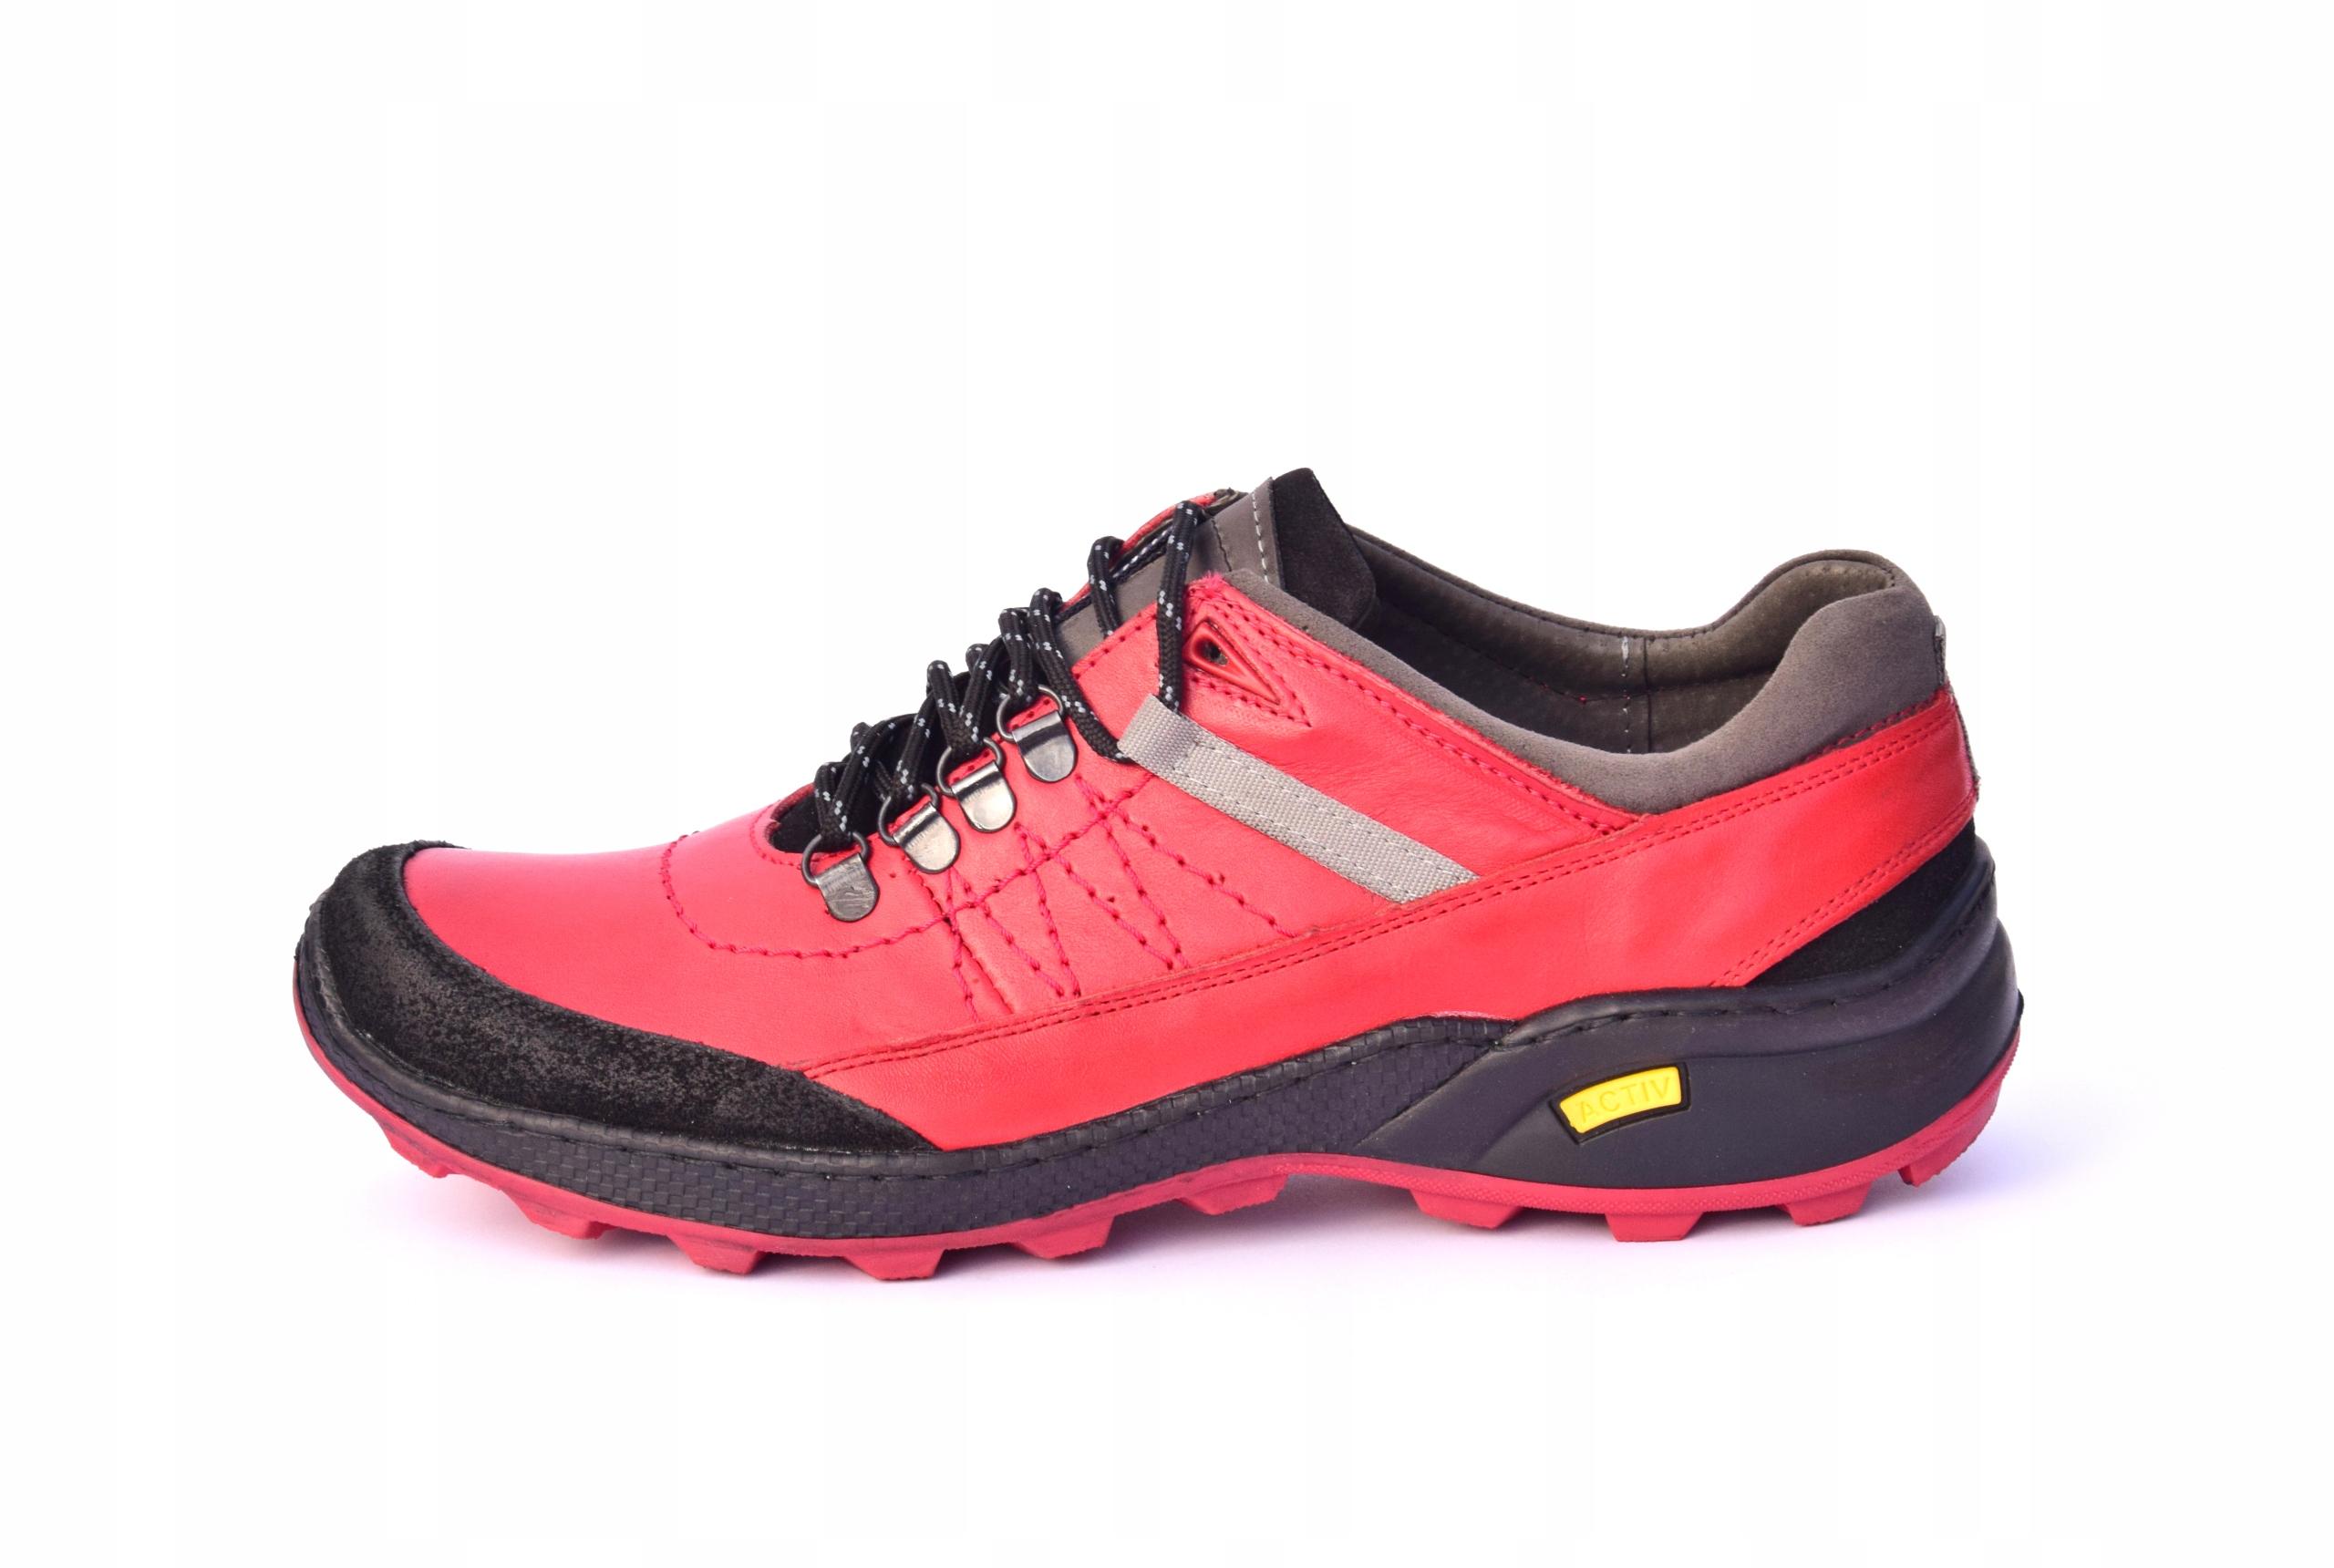 Skórzane obuwie trekkingowe 274